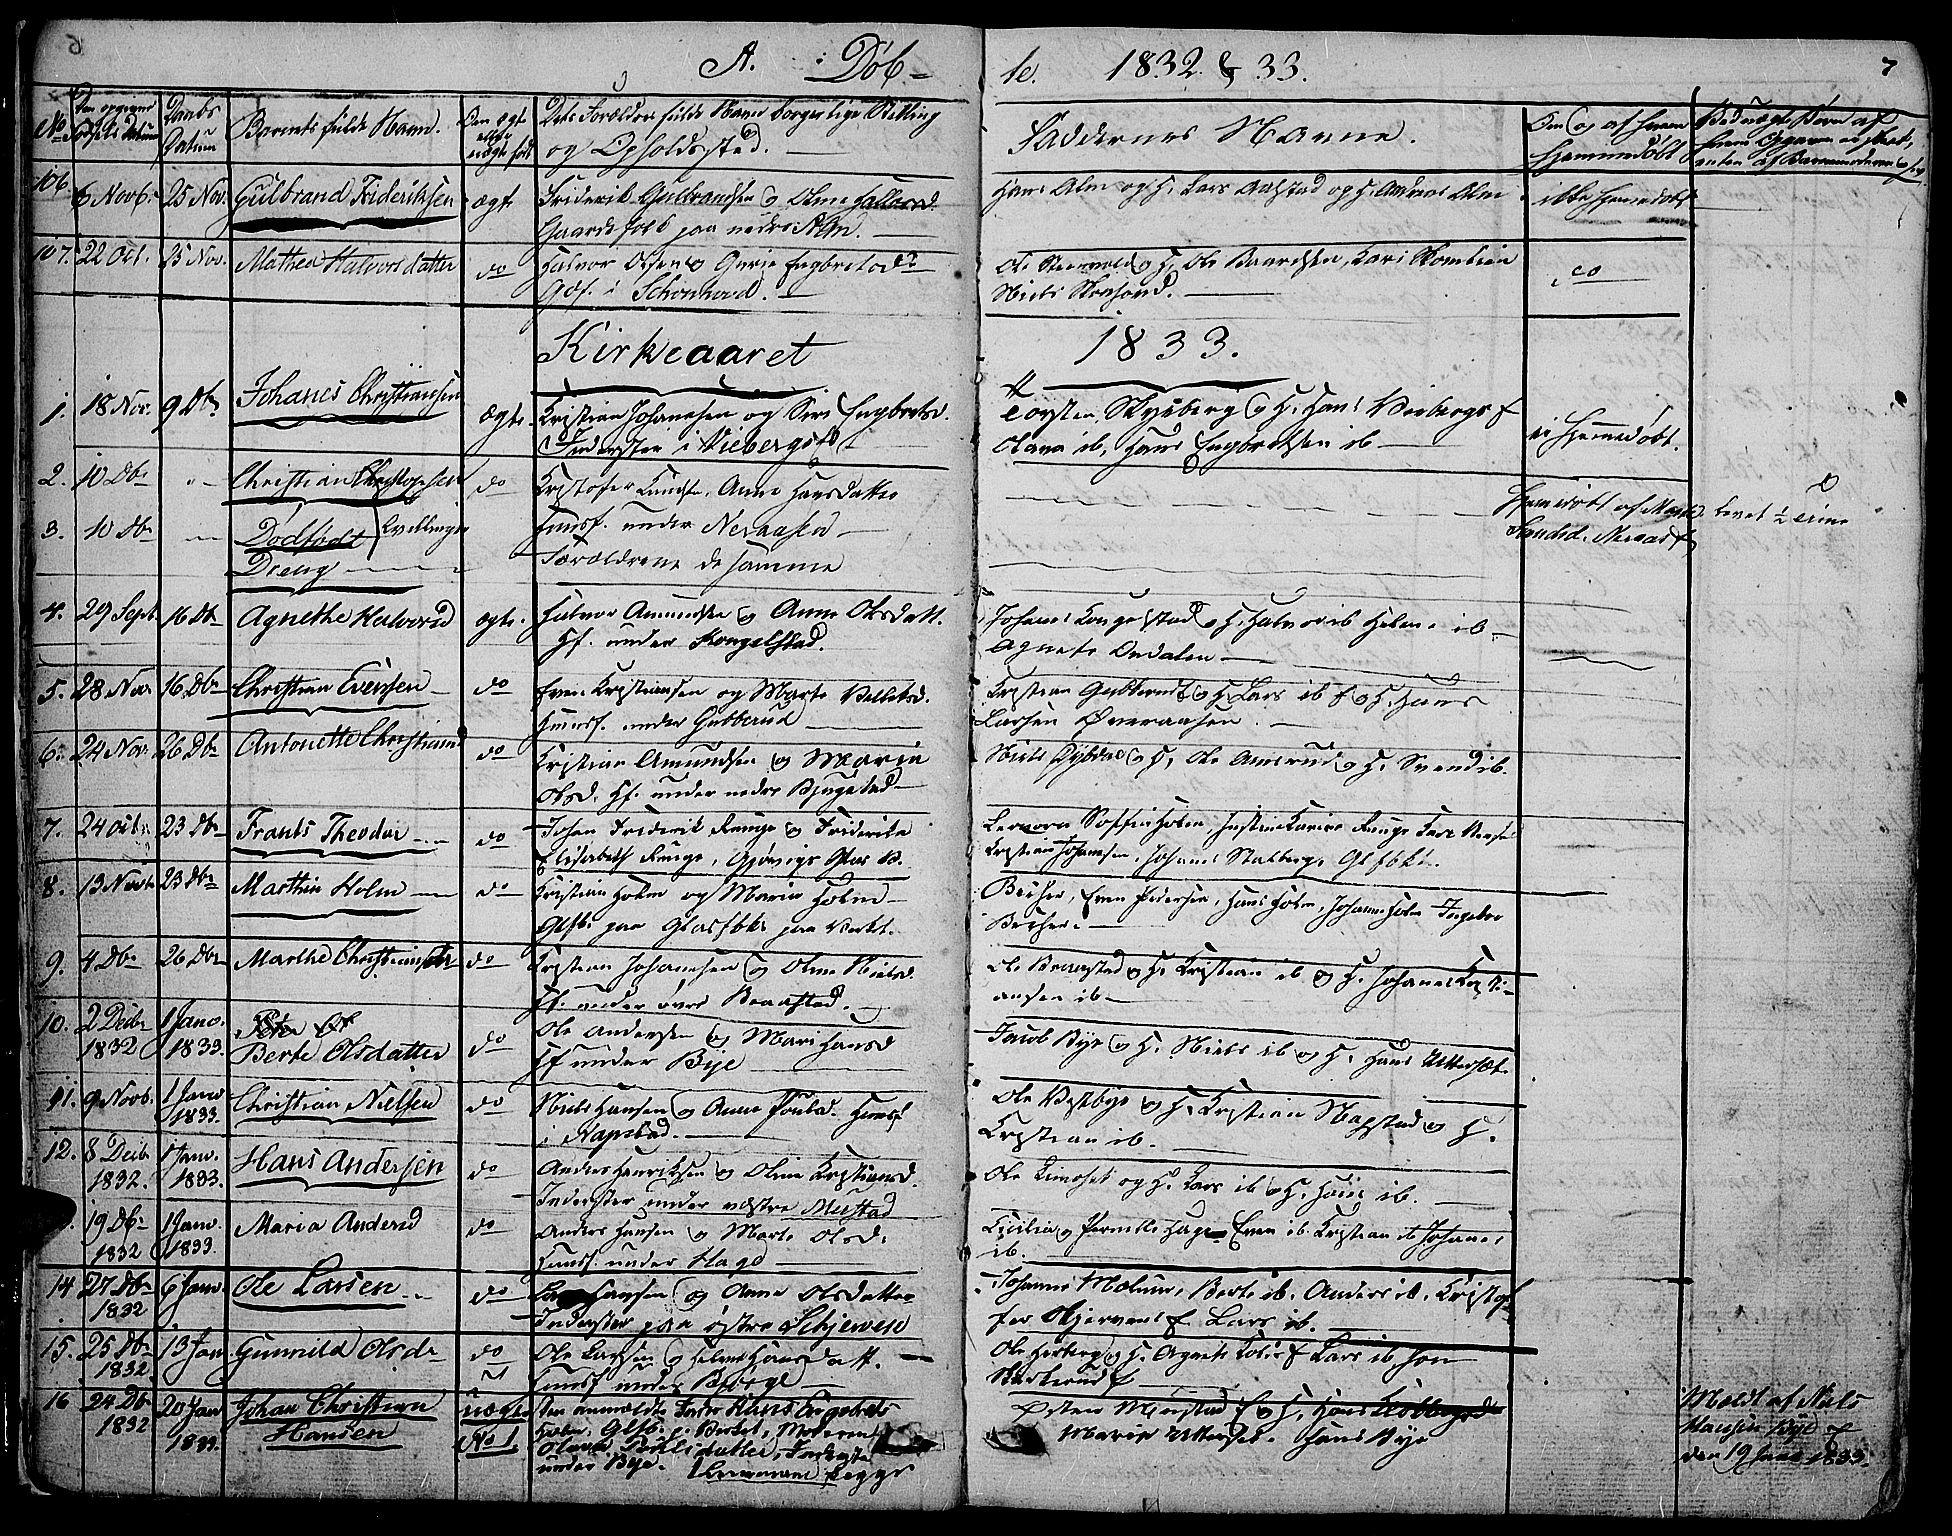 SAH, Vardal prestekontor, H/Ha/Hab/L0004: Klokkerbok nr. 4, 1831-1853, s. 7